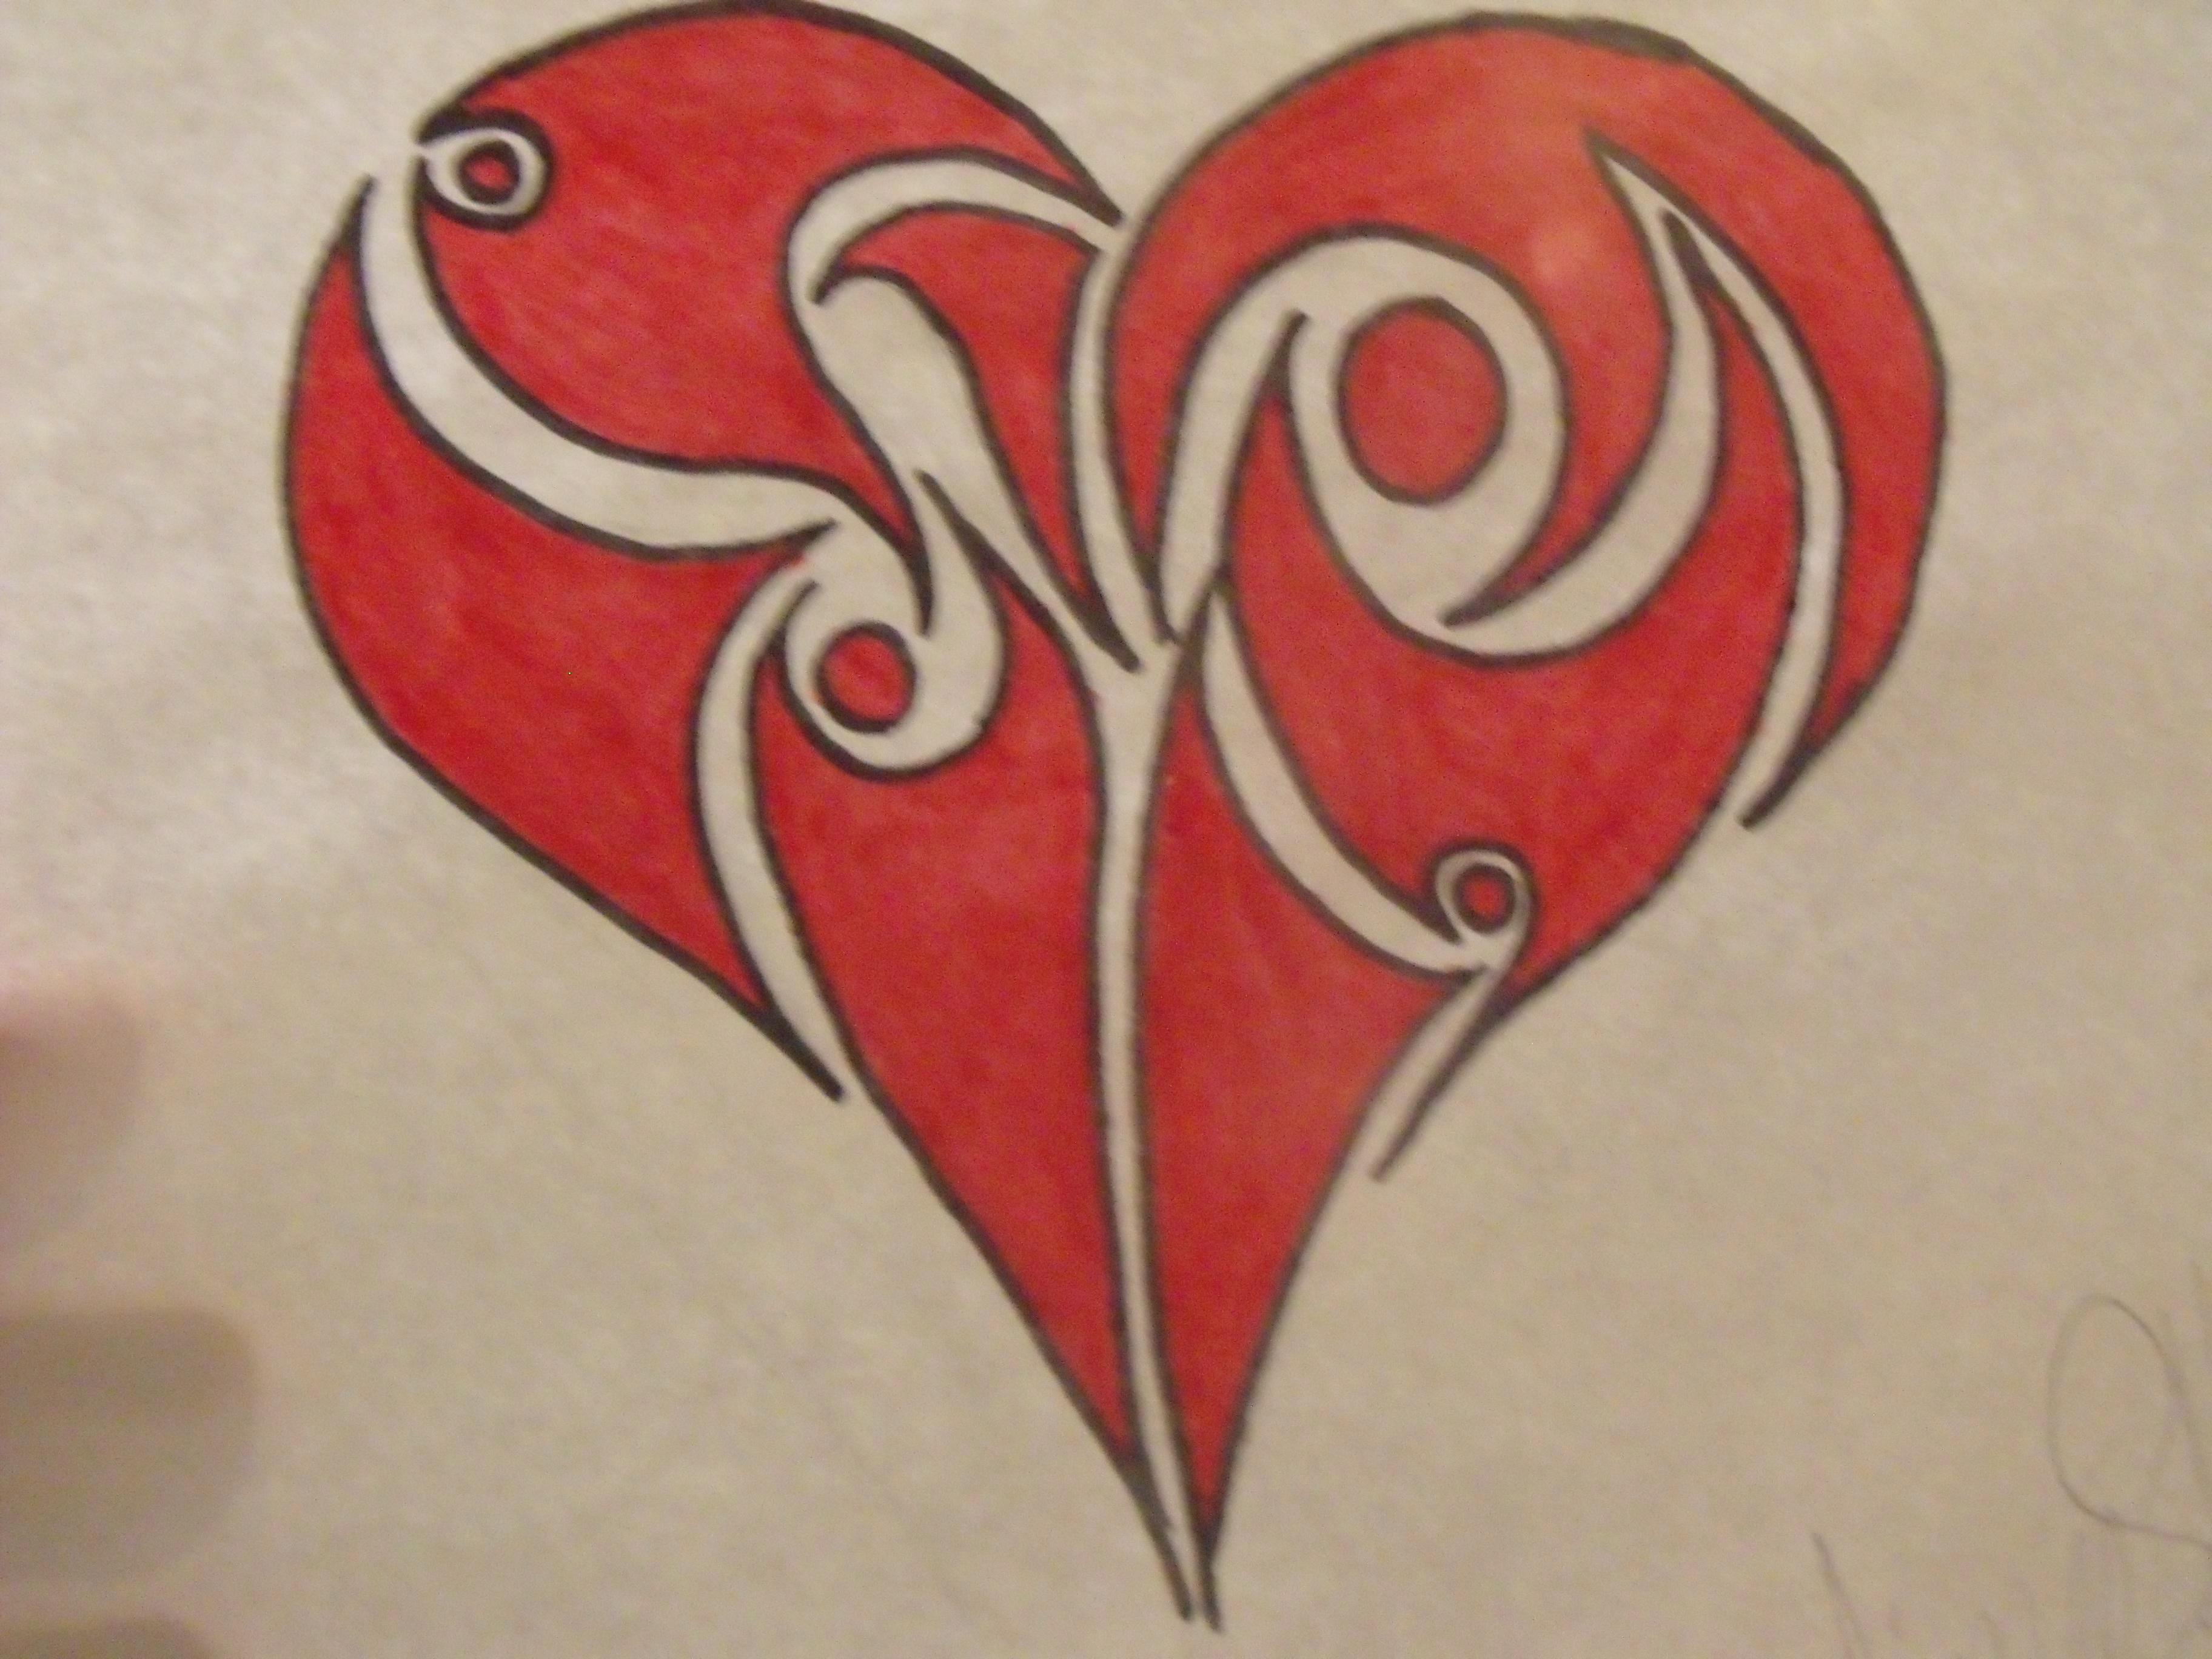 3648x2736 Cool Drawings Of Hearts Cool Drawings Of Hearts Free Download Cool